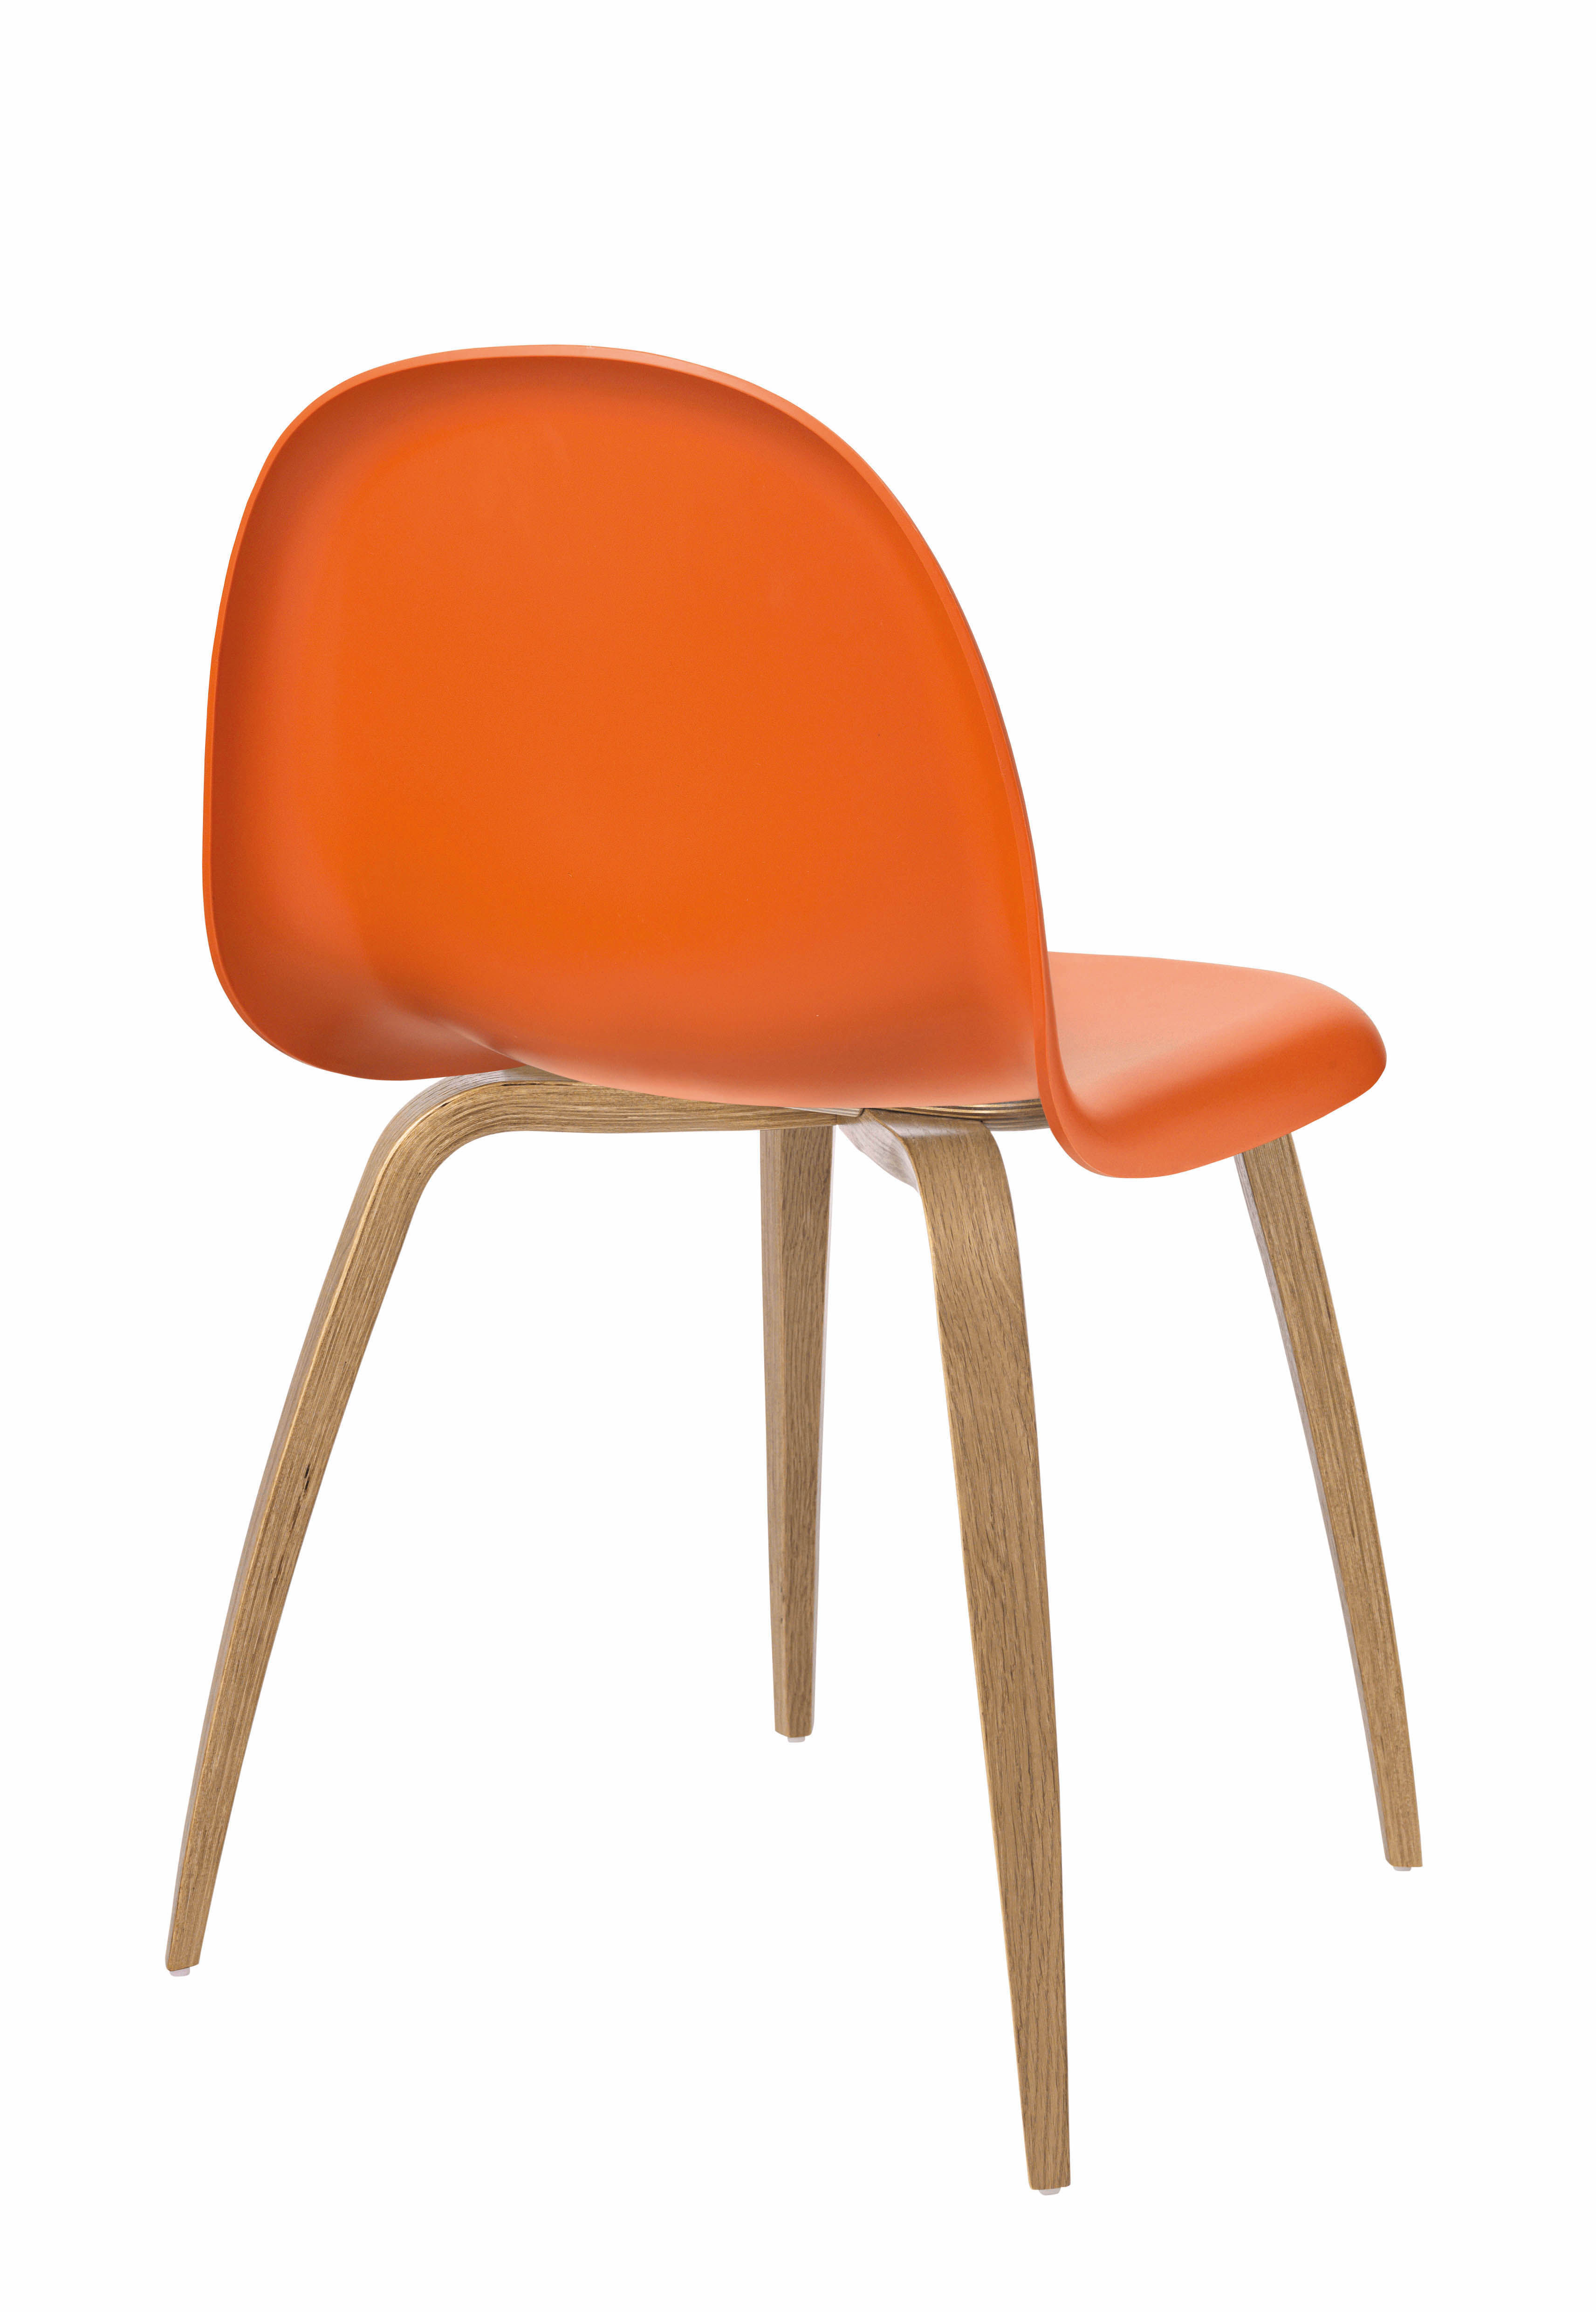 Chaise Coque Plastique Pied Bois - Chaise Gubi 5 Coque plastique& pieds bois Coque orange Pi u00e8tement ch u00eane Gubi